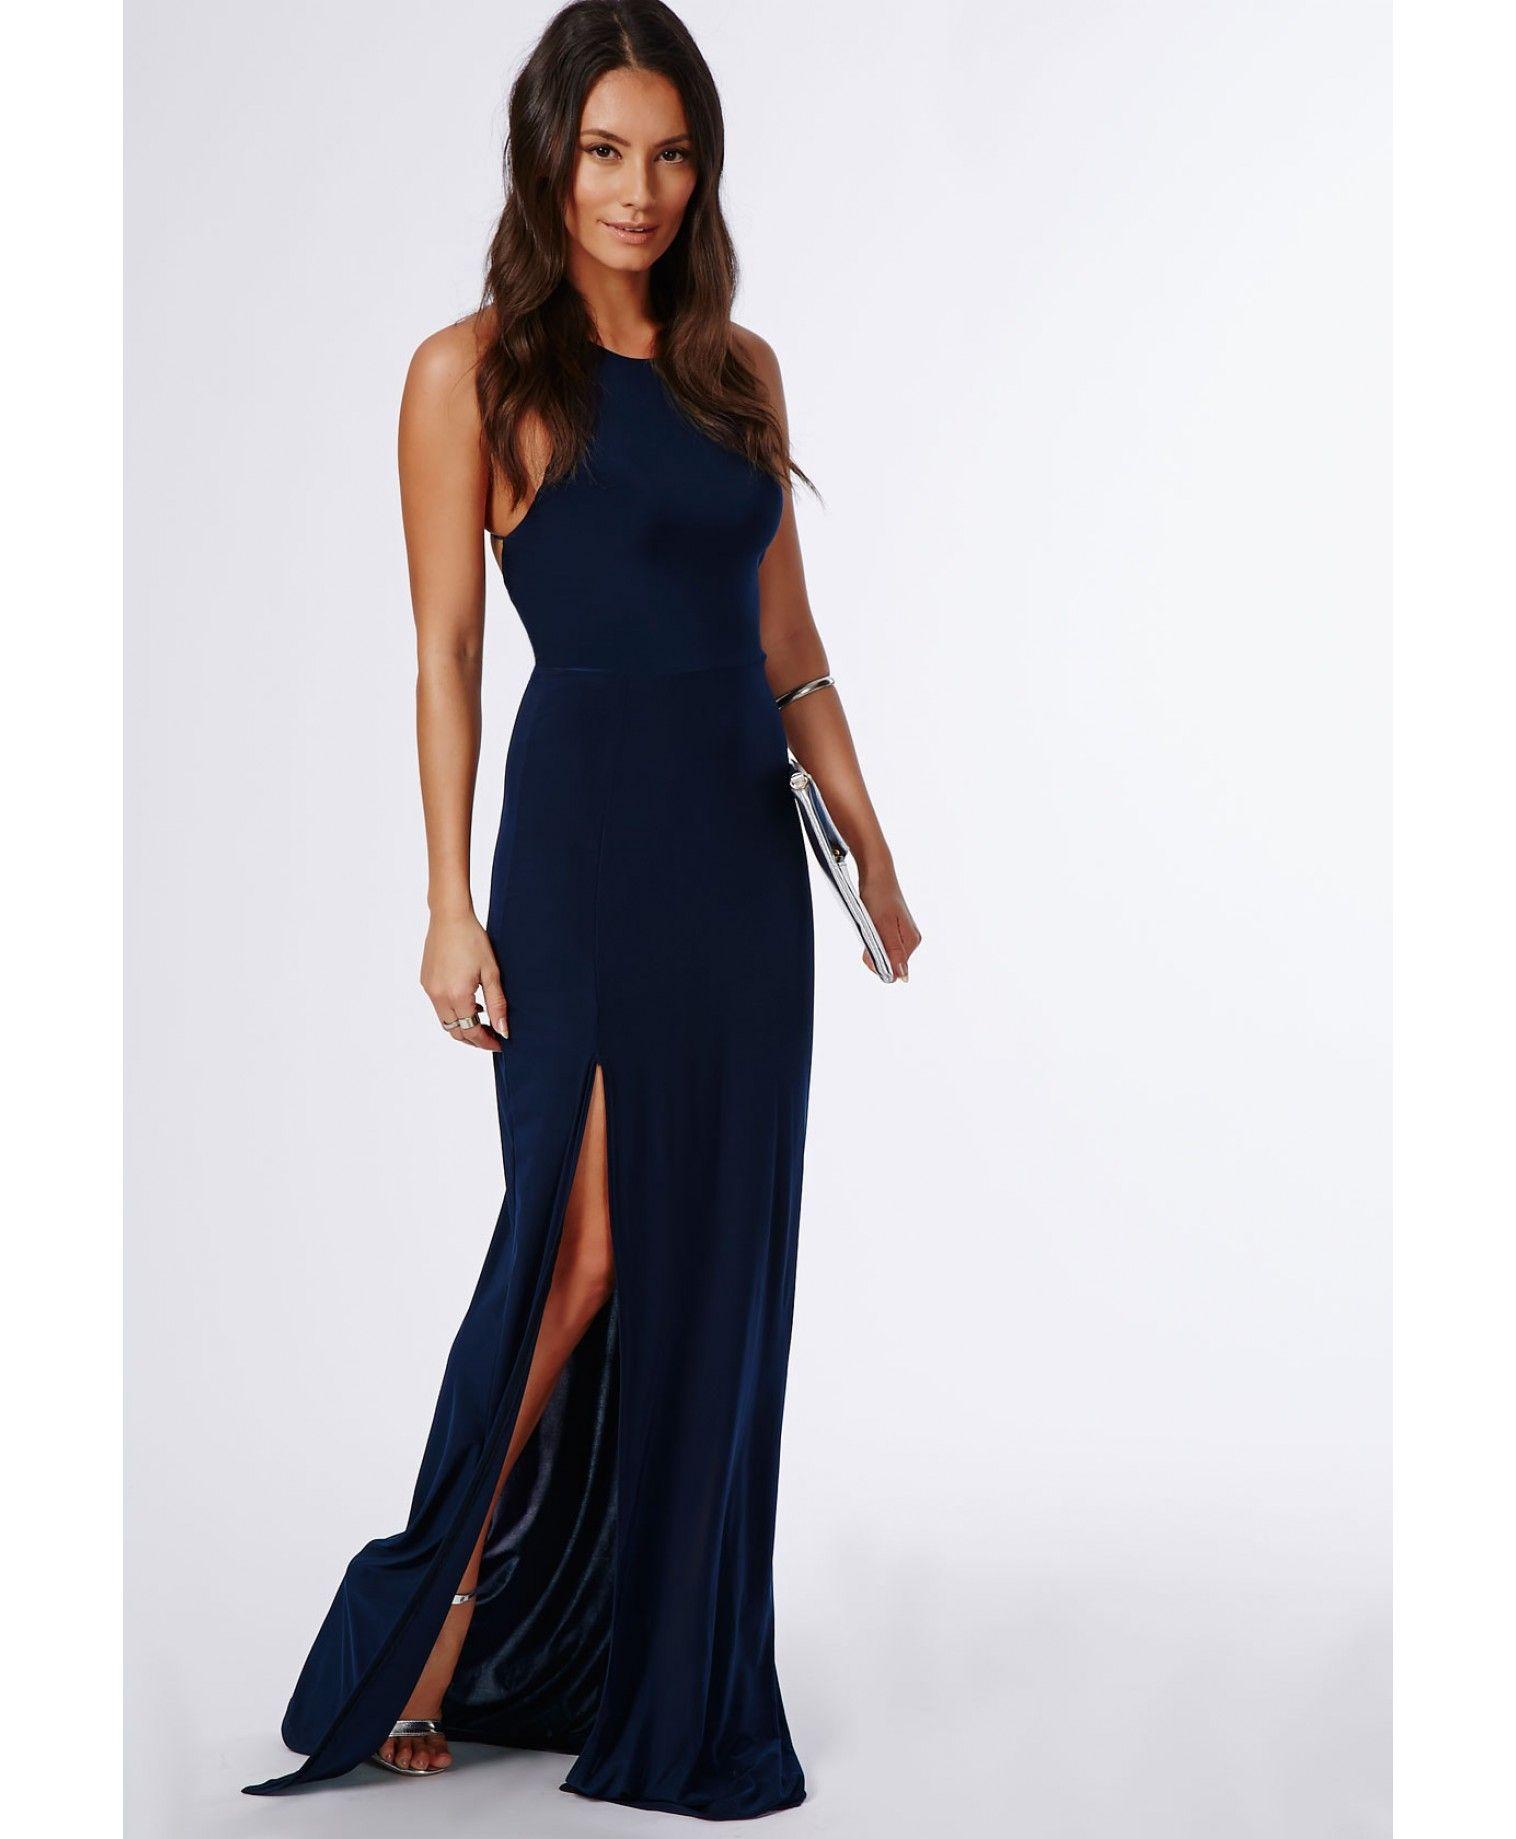 Nora Navy High Neck Maxi Dress - Dresses - Maxi Dresses - Missguided ... ef17a0f47